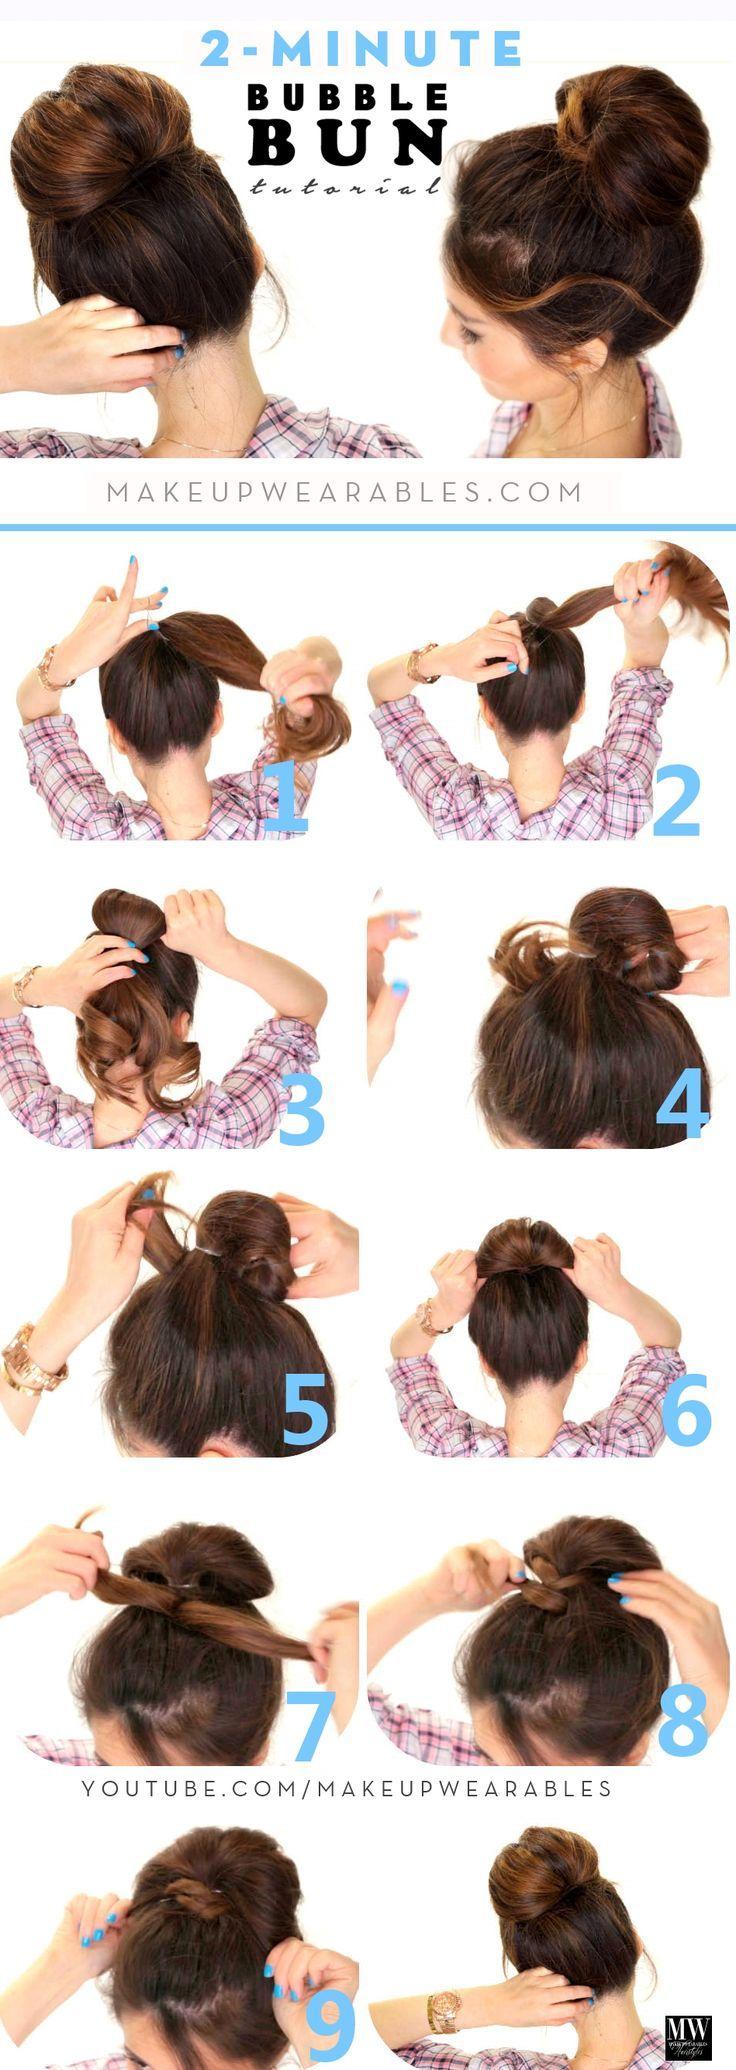 Surprising 1000 Ideas About Easy Bun Hairstyles On Pinterest Easy Bun Bun Short Hairstyles For Black Women Fulllsitofus